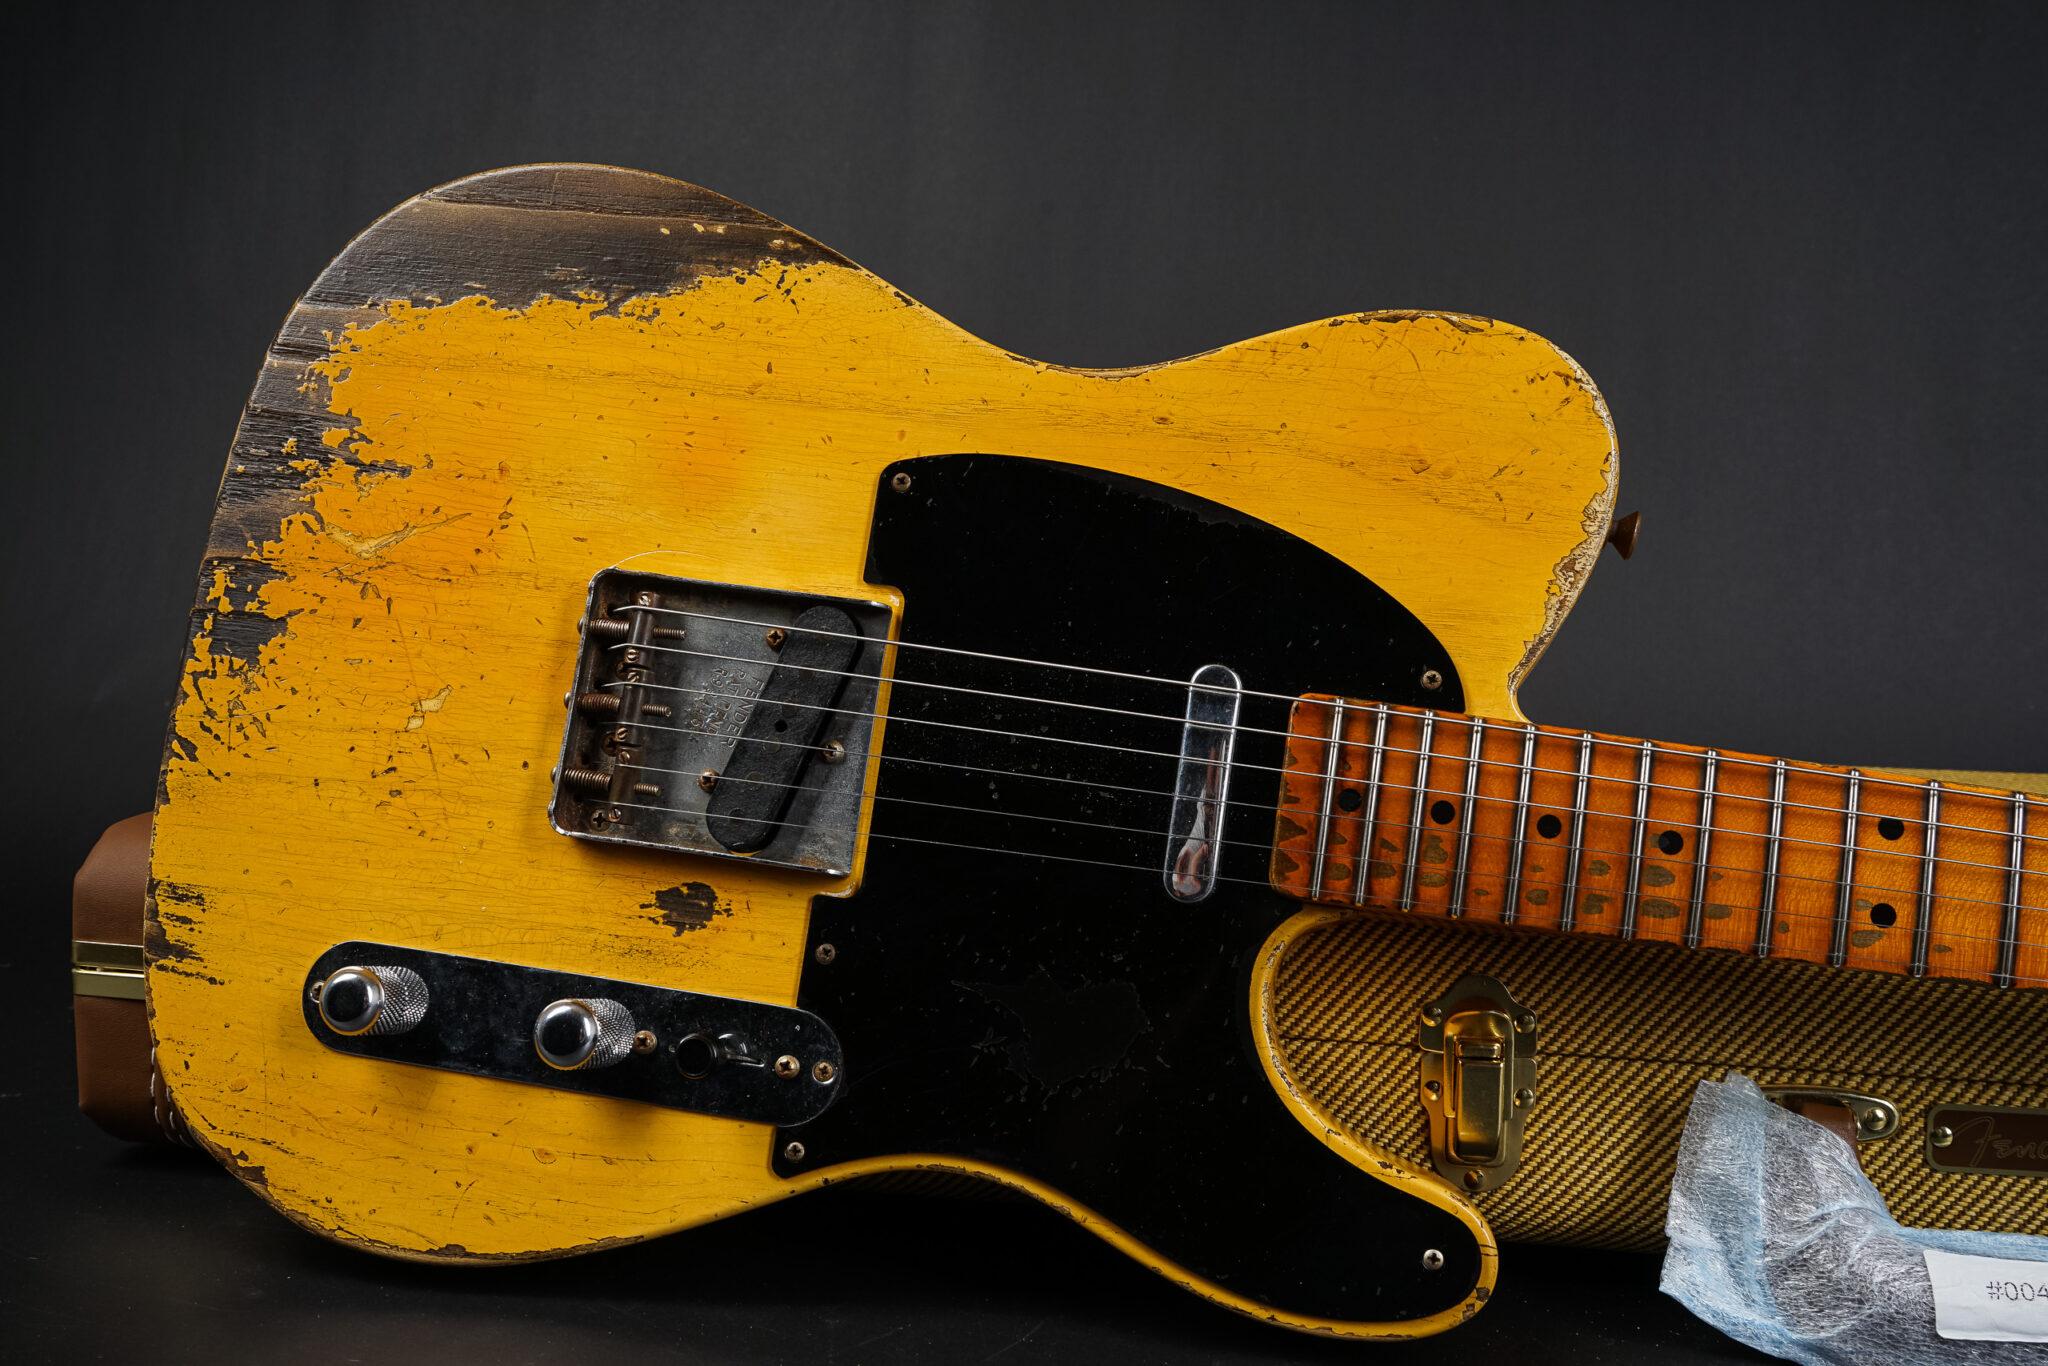 https://guitarpoint.de/app/uploads/products/2021-fender-carlos-lopez-masterbuilt-1952-telecaster-heavy-relic-blonde/2021-Fender-Carlos-Lopez-masterbuilt-Telecaster-R99445-9-2048x1366.jpg